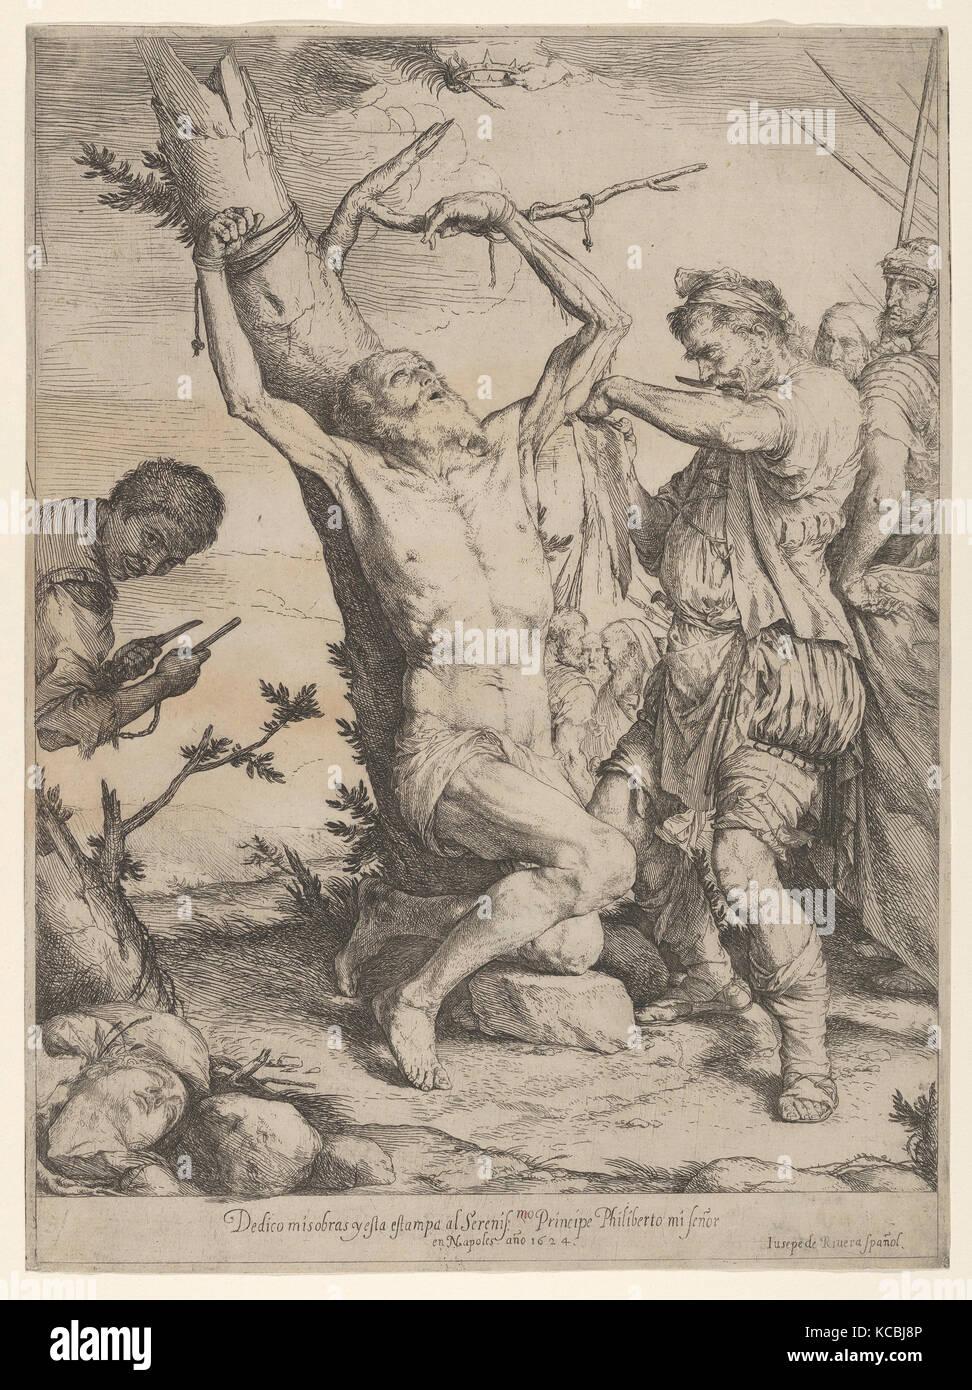 The Martyrdom of Saint Bartholomew, Jusepe de Ribera, 1624 - Stock Image